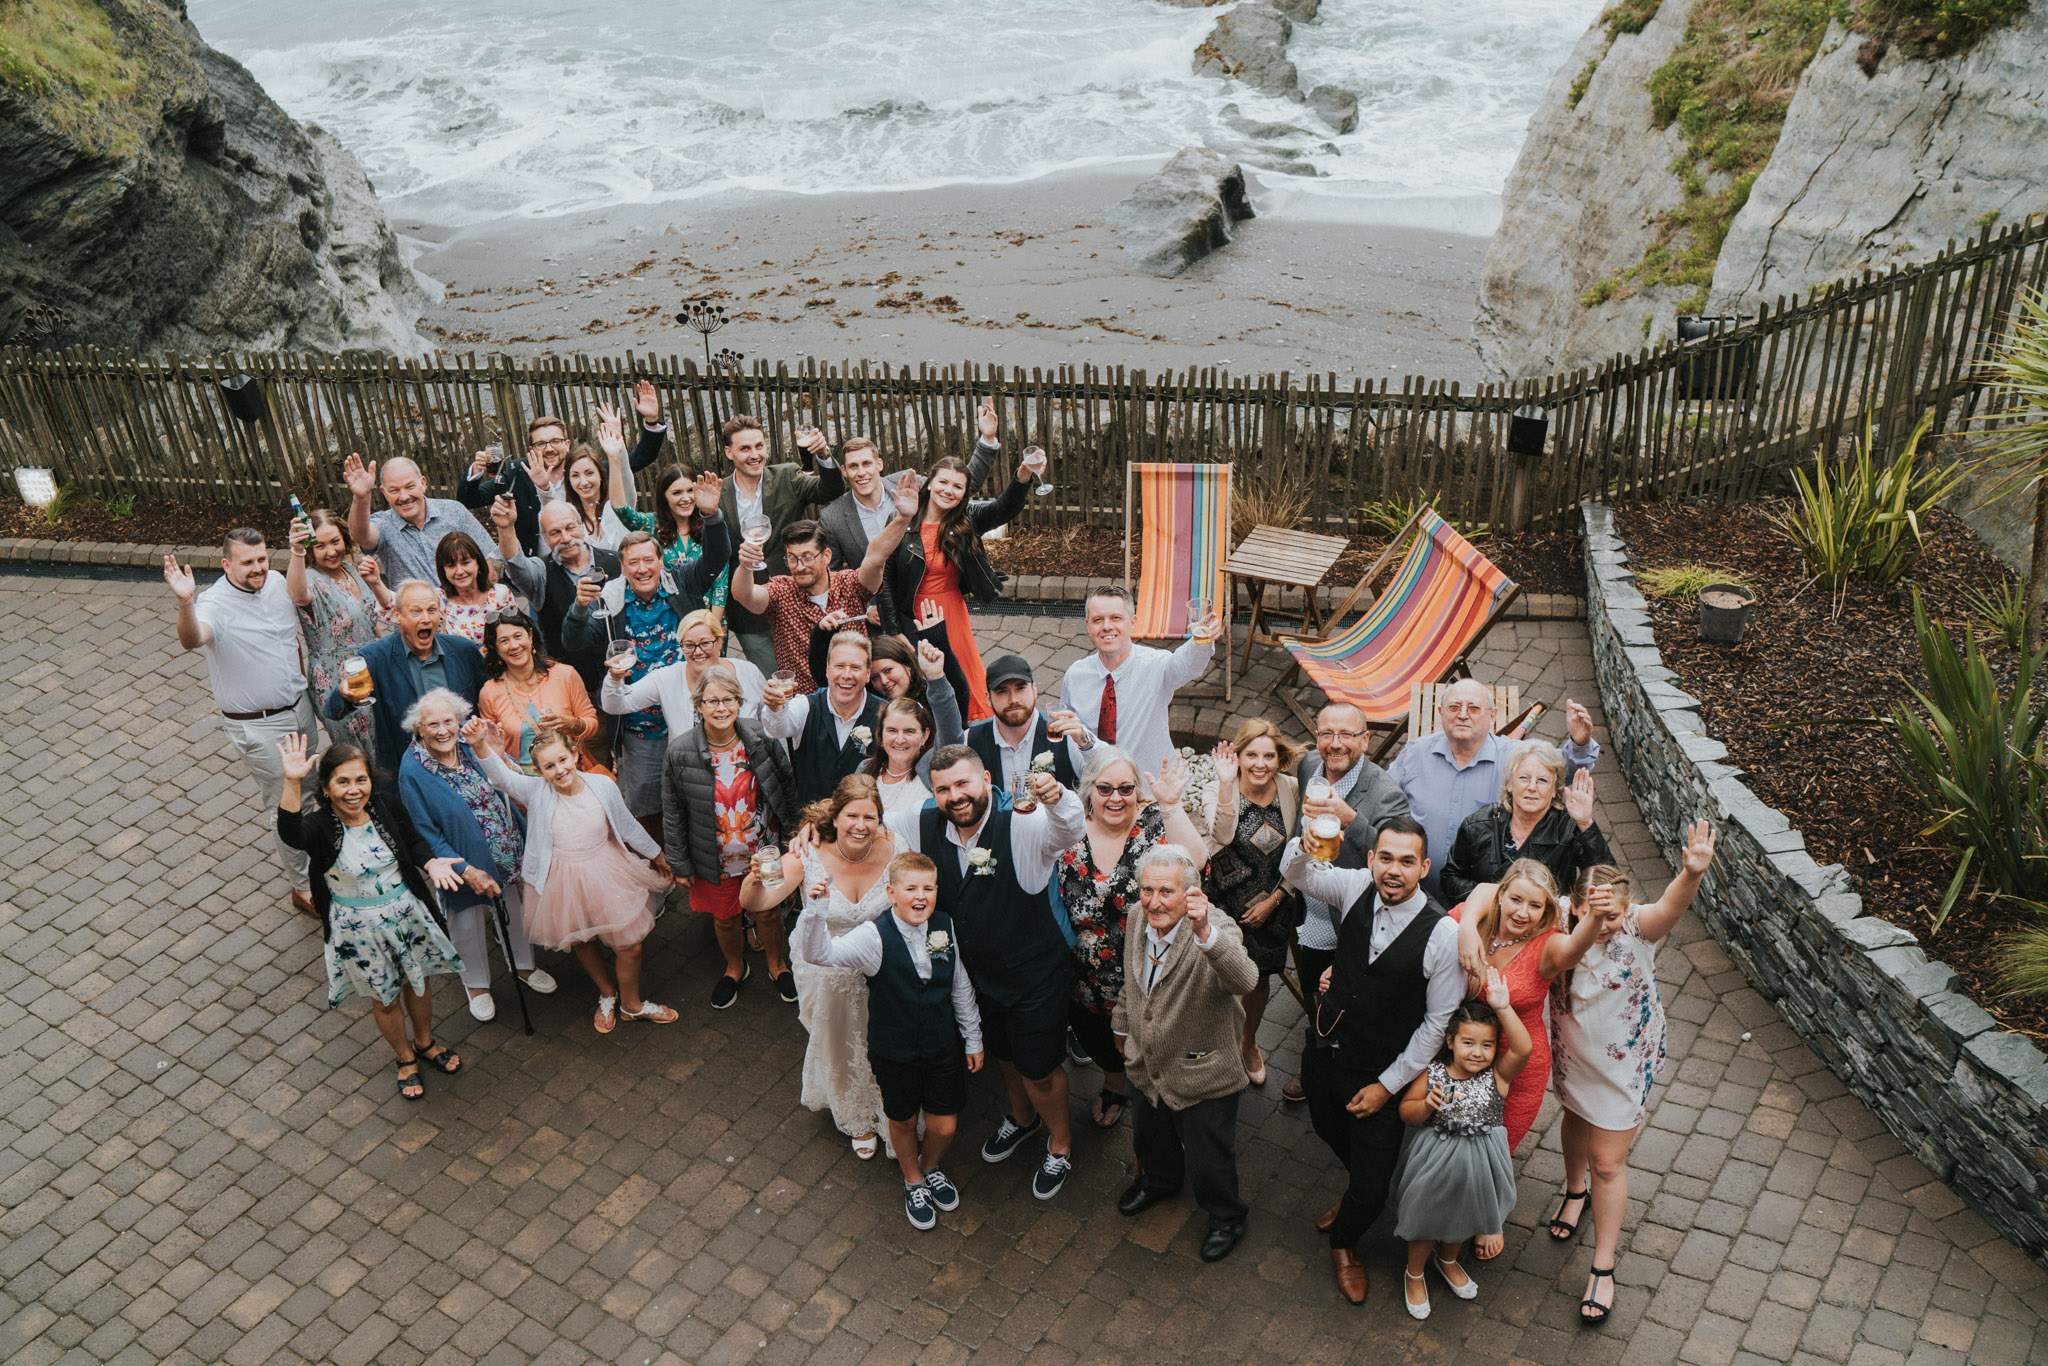 John-Amy-Tunnels-Beaches-Ilfracombe-Devon-Outdoor-Wedding-UK-Colchester-Essex-Alternative-Wedding-Photographer-Grace-Elizabeth (24 of 31).jpg